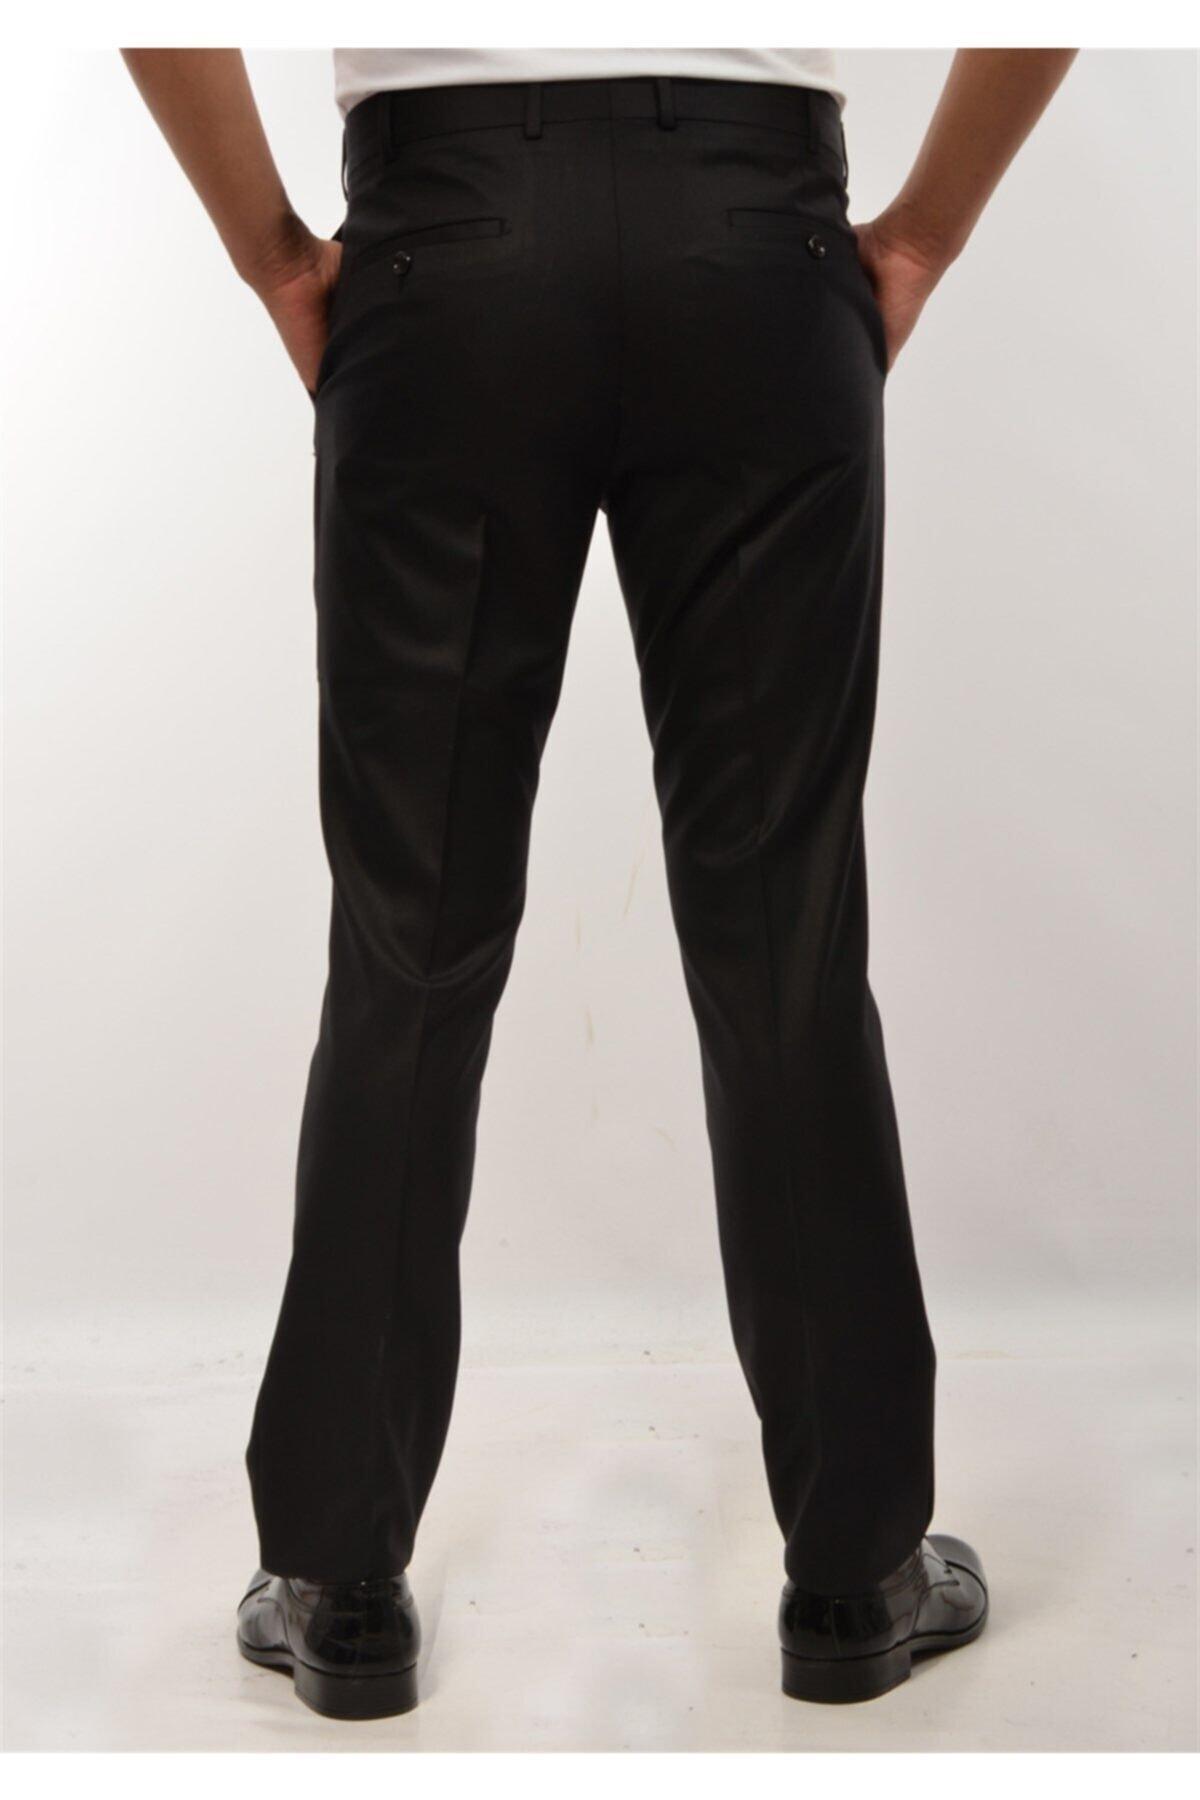 ModaPlaza Erkek Pantolon Siyah Kumaş 2